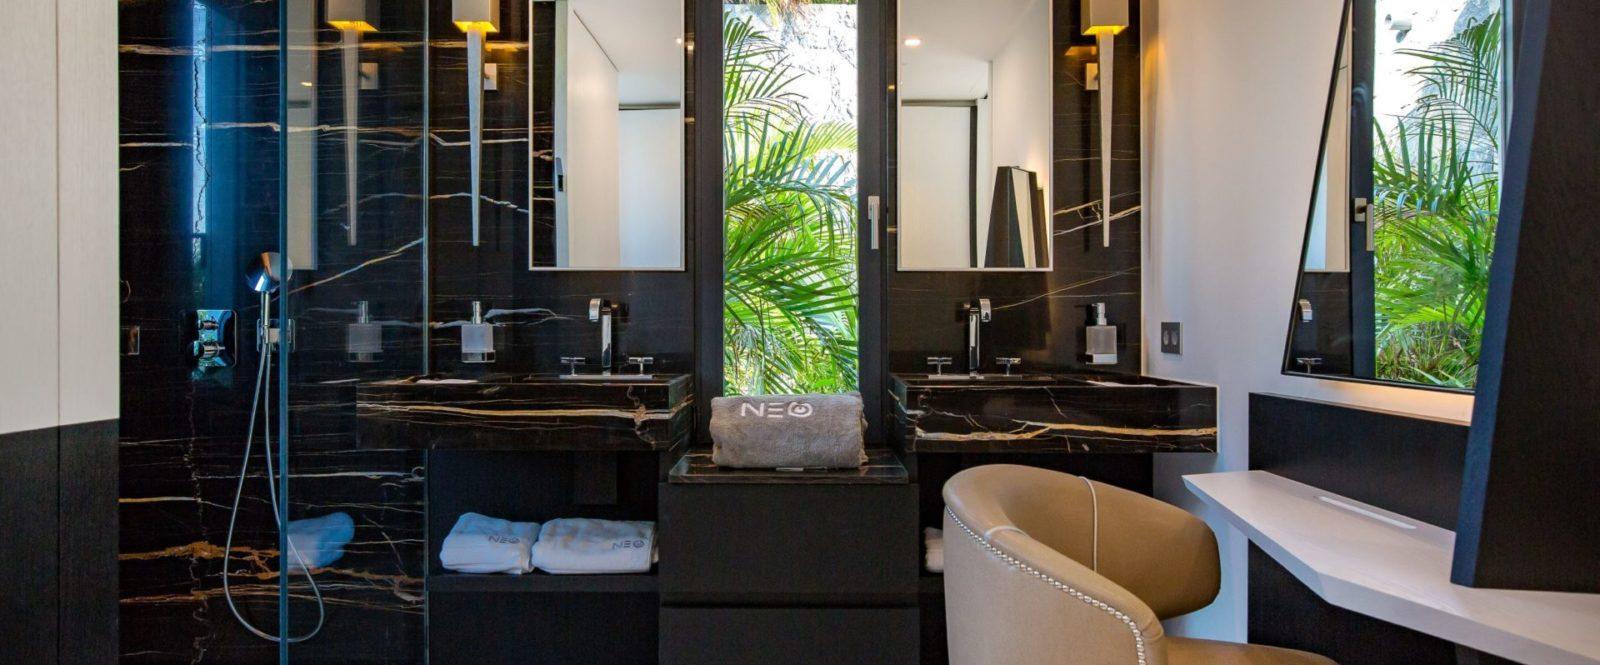 NEO - guest-suite-3-bathroom